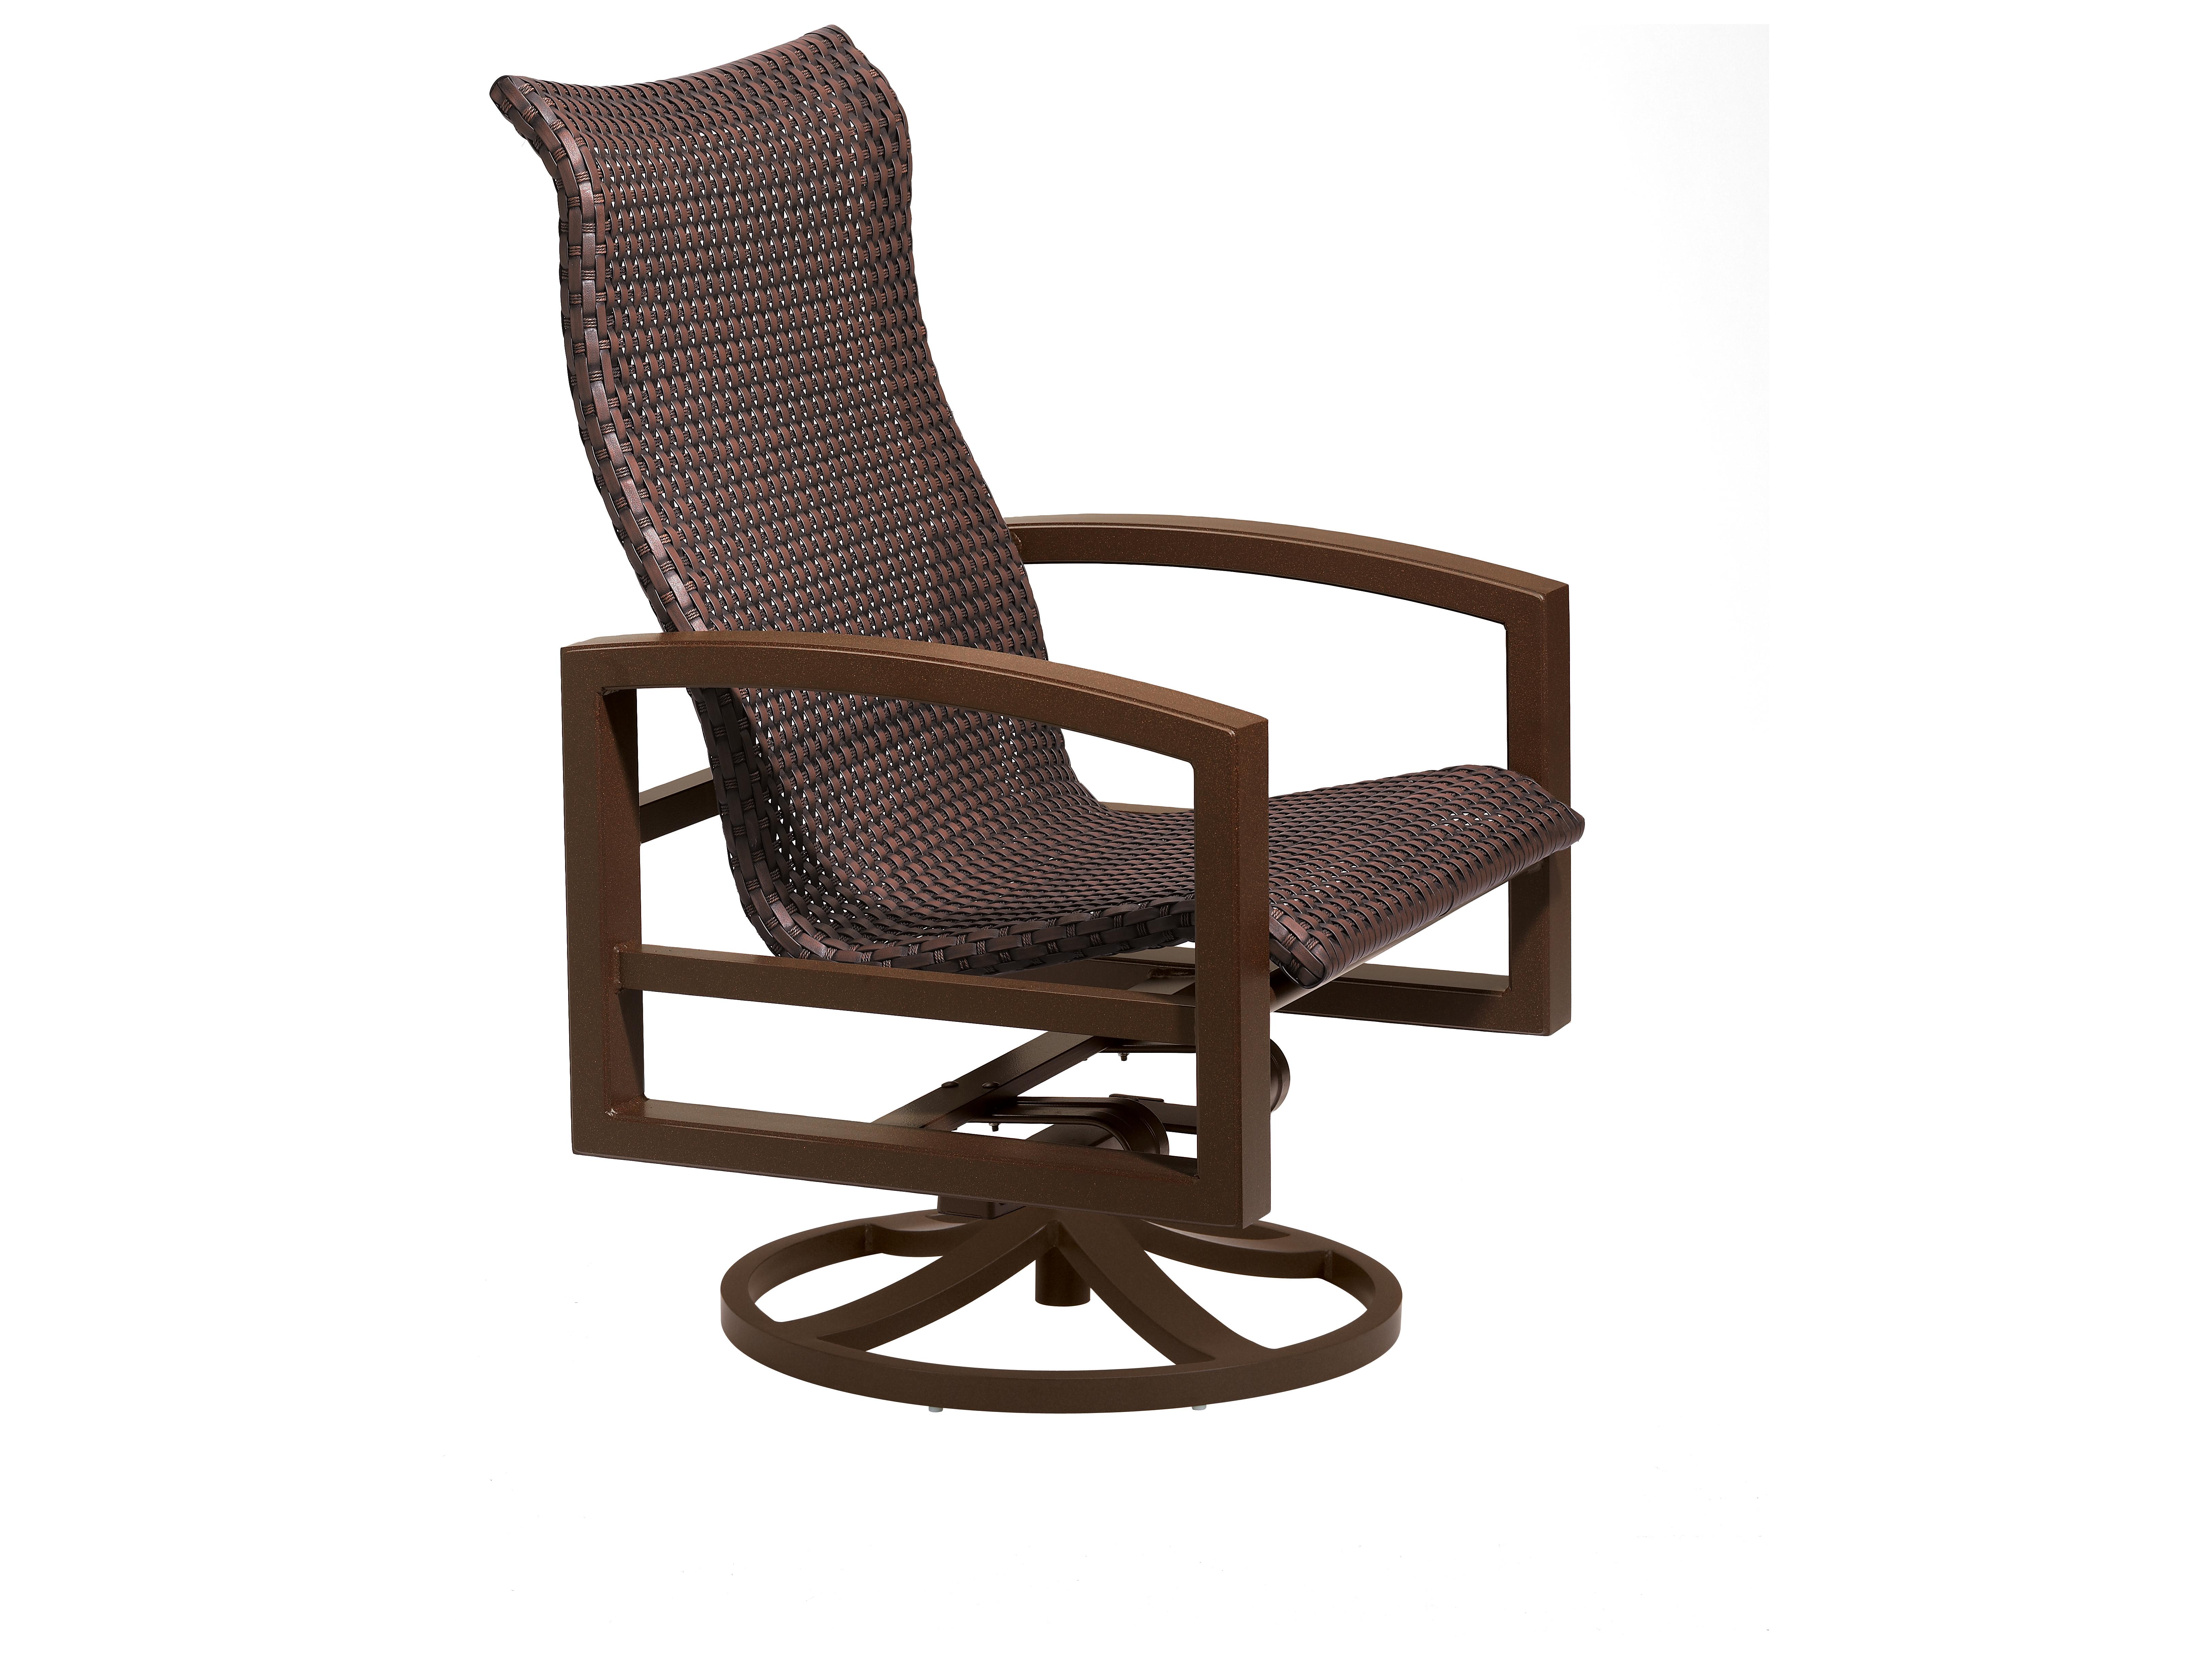 Tropitone Lakeside Woven Swivel Action Lounge Chair